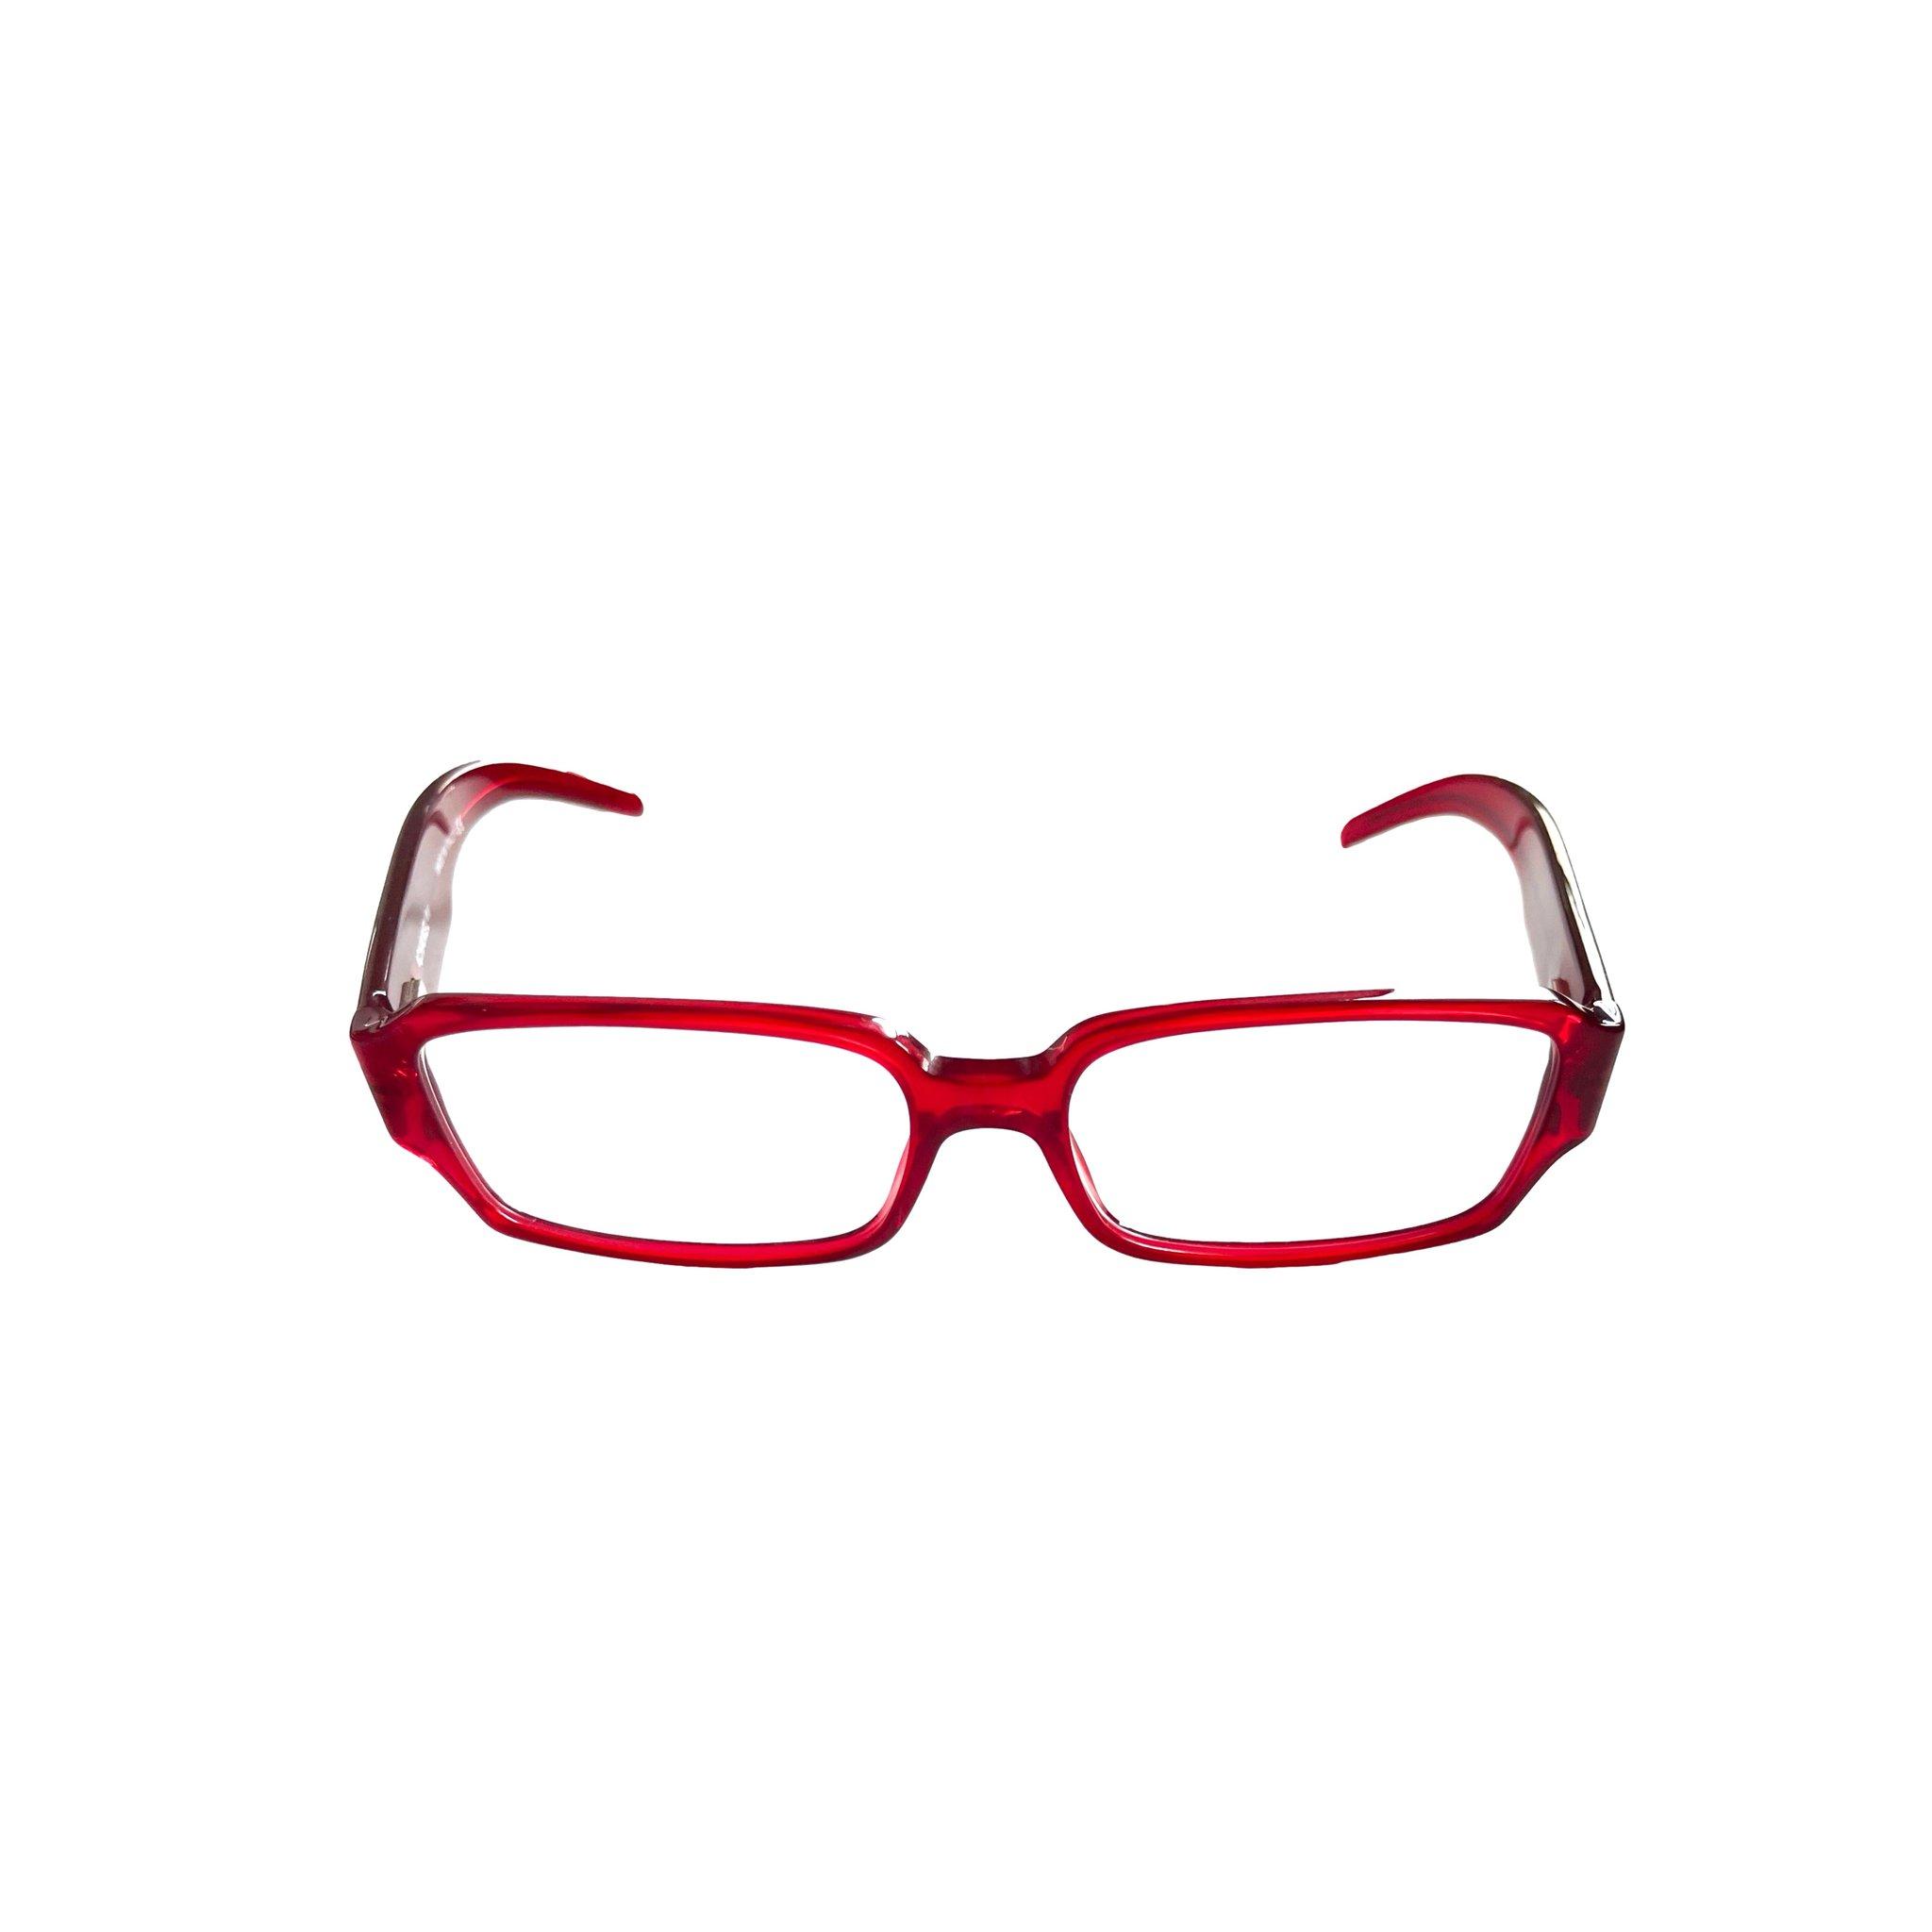 Chanel Red Rhinestone Slim Glasses by treasure, available on treasuresofnewyorkcity.com for $310 Bella Hadid Sunglasses Exact Product